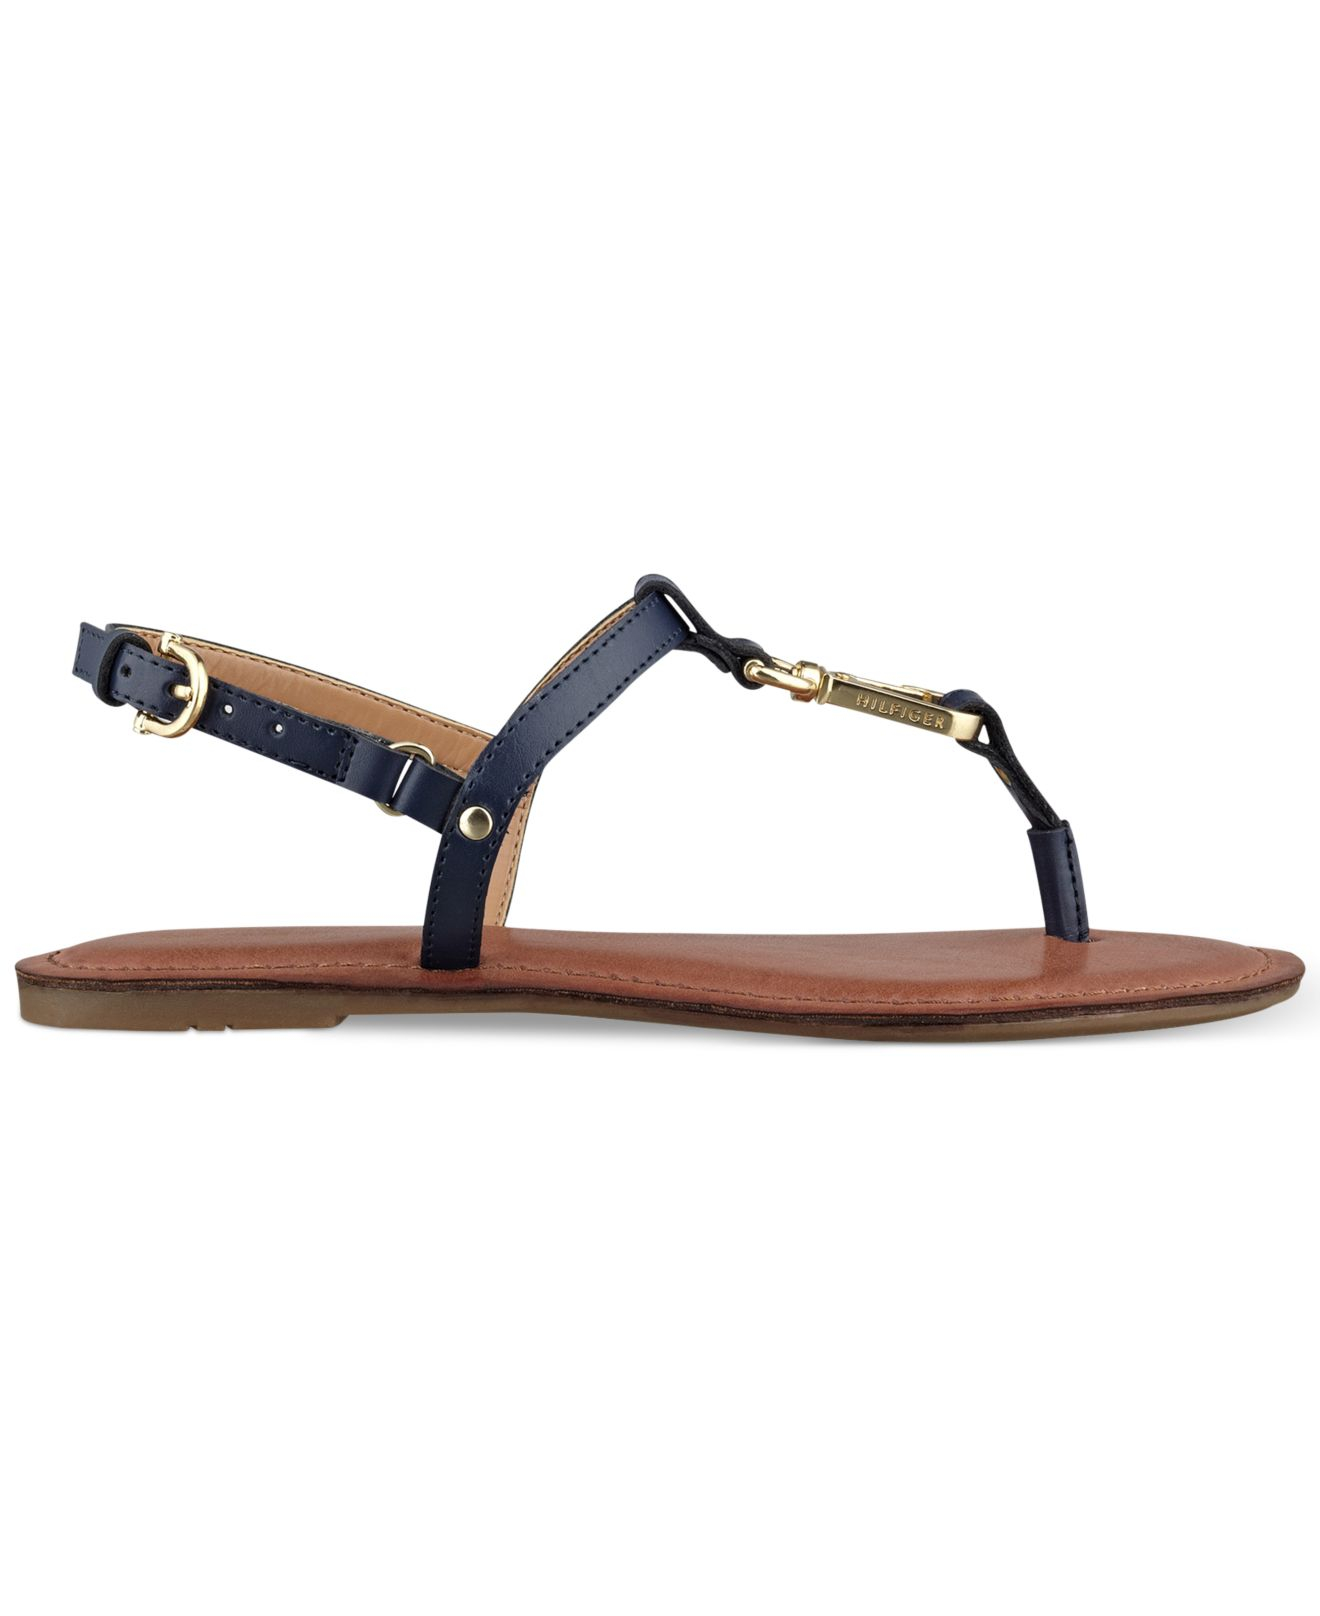 ff802e53d Lyst - Tommy Hilfiger Women S Lenita Thong Sandals in Blue